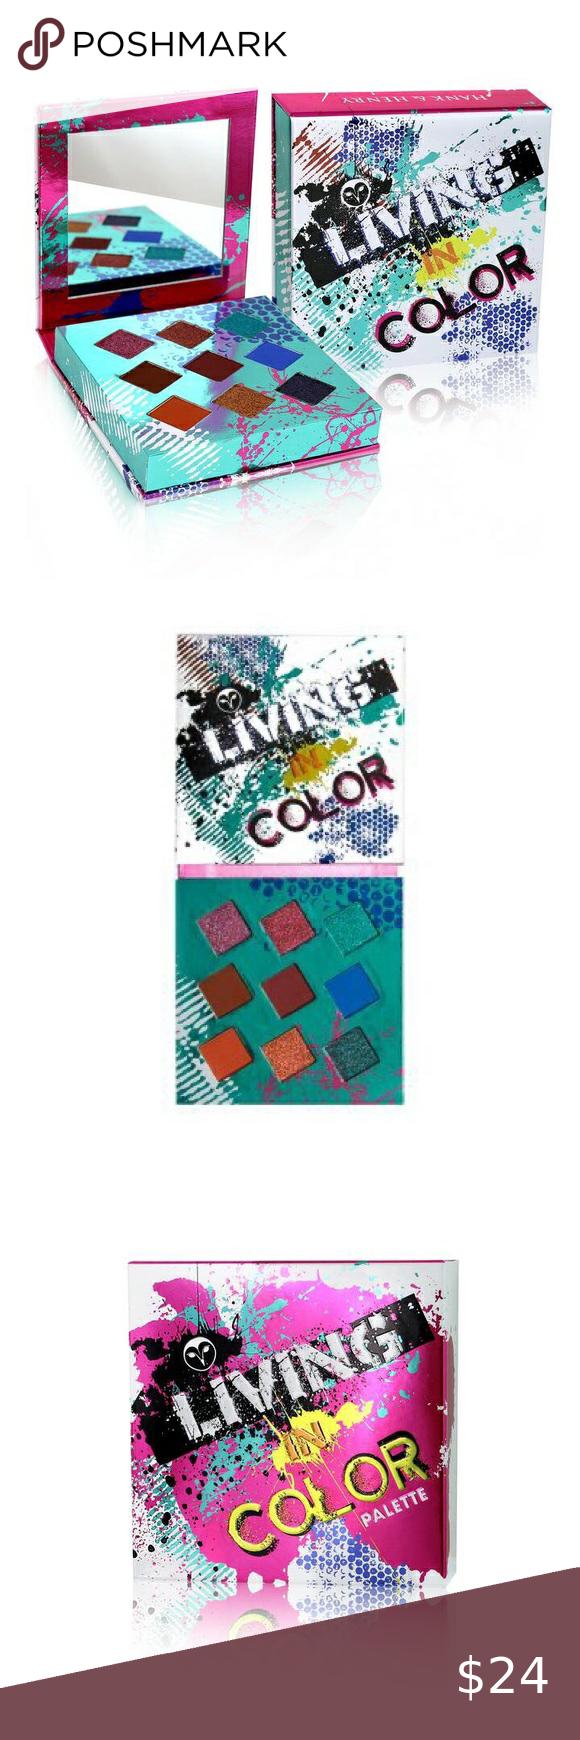 Hank & Henry Living In Color Eye Palette 🎨 in 2020 Eye